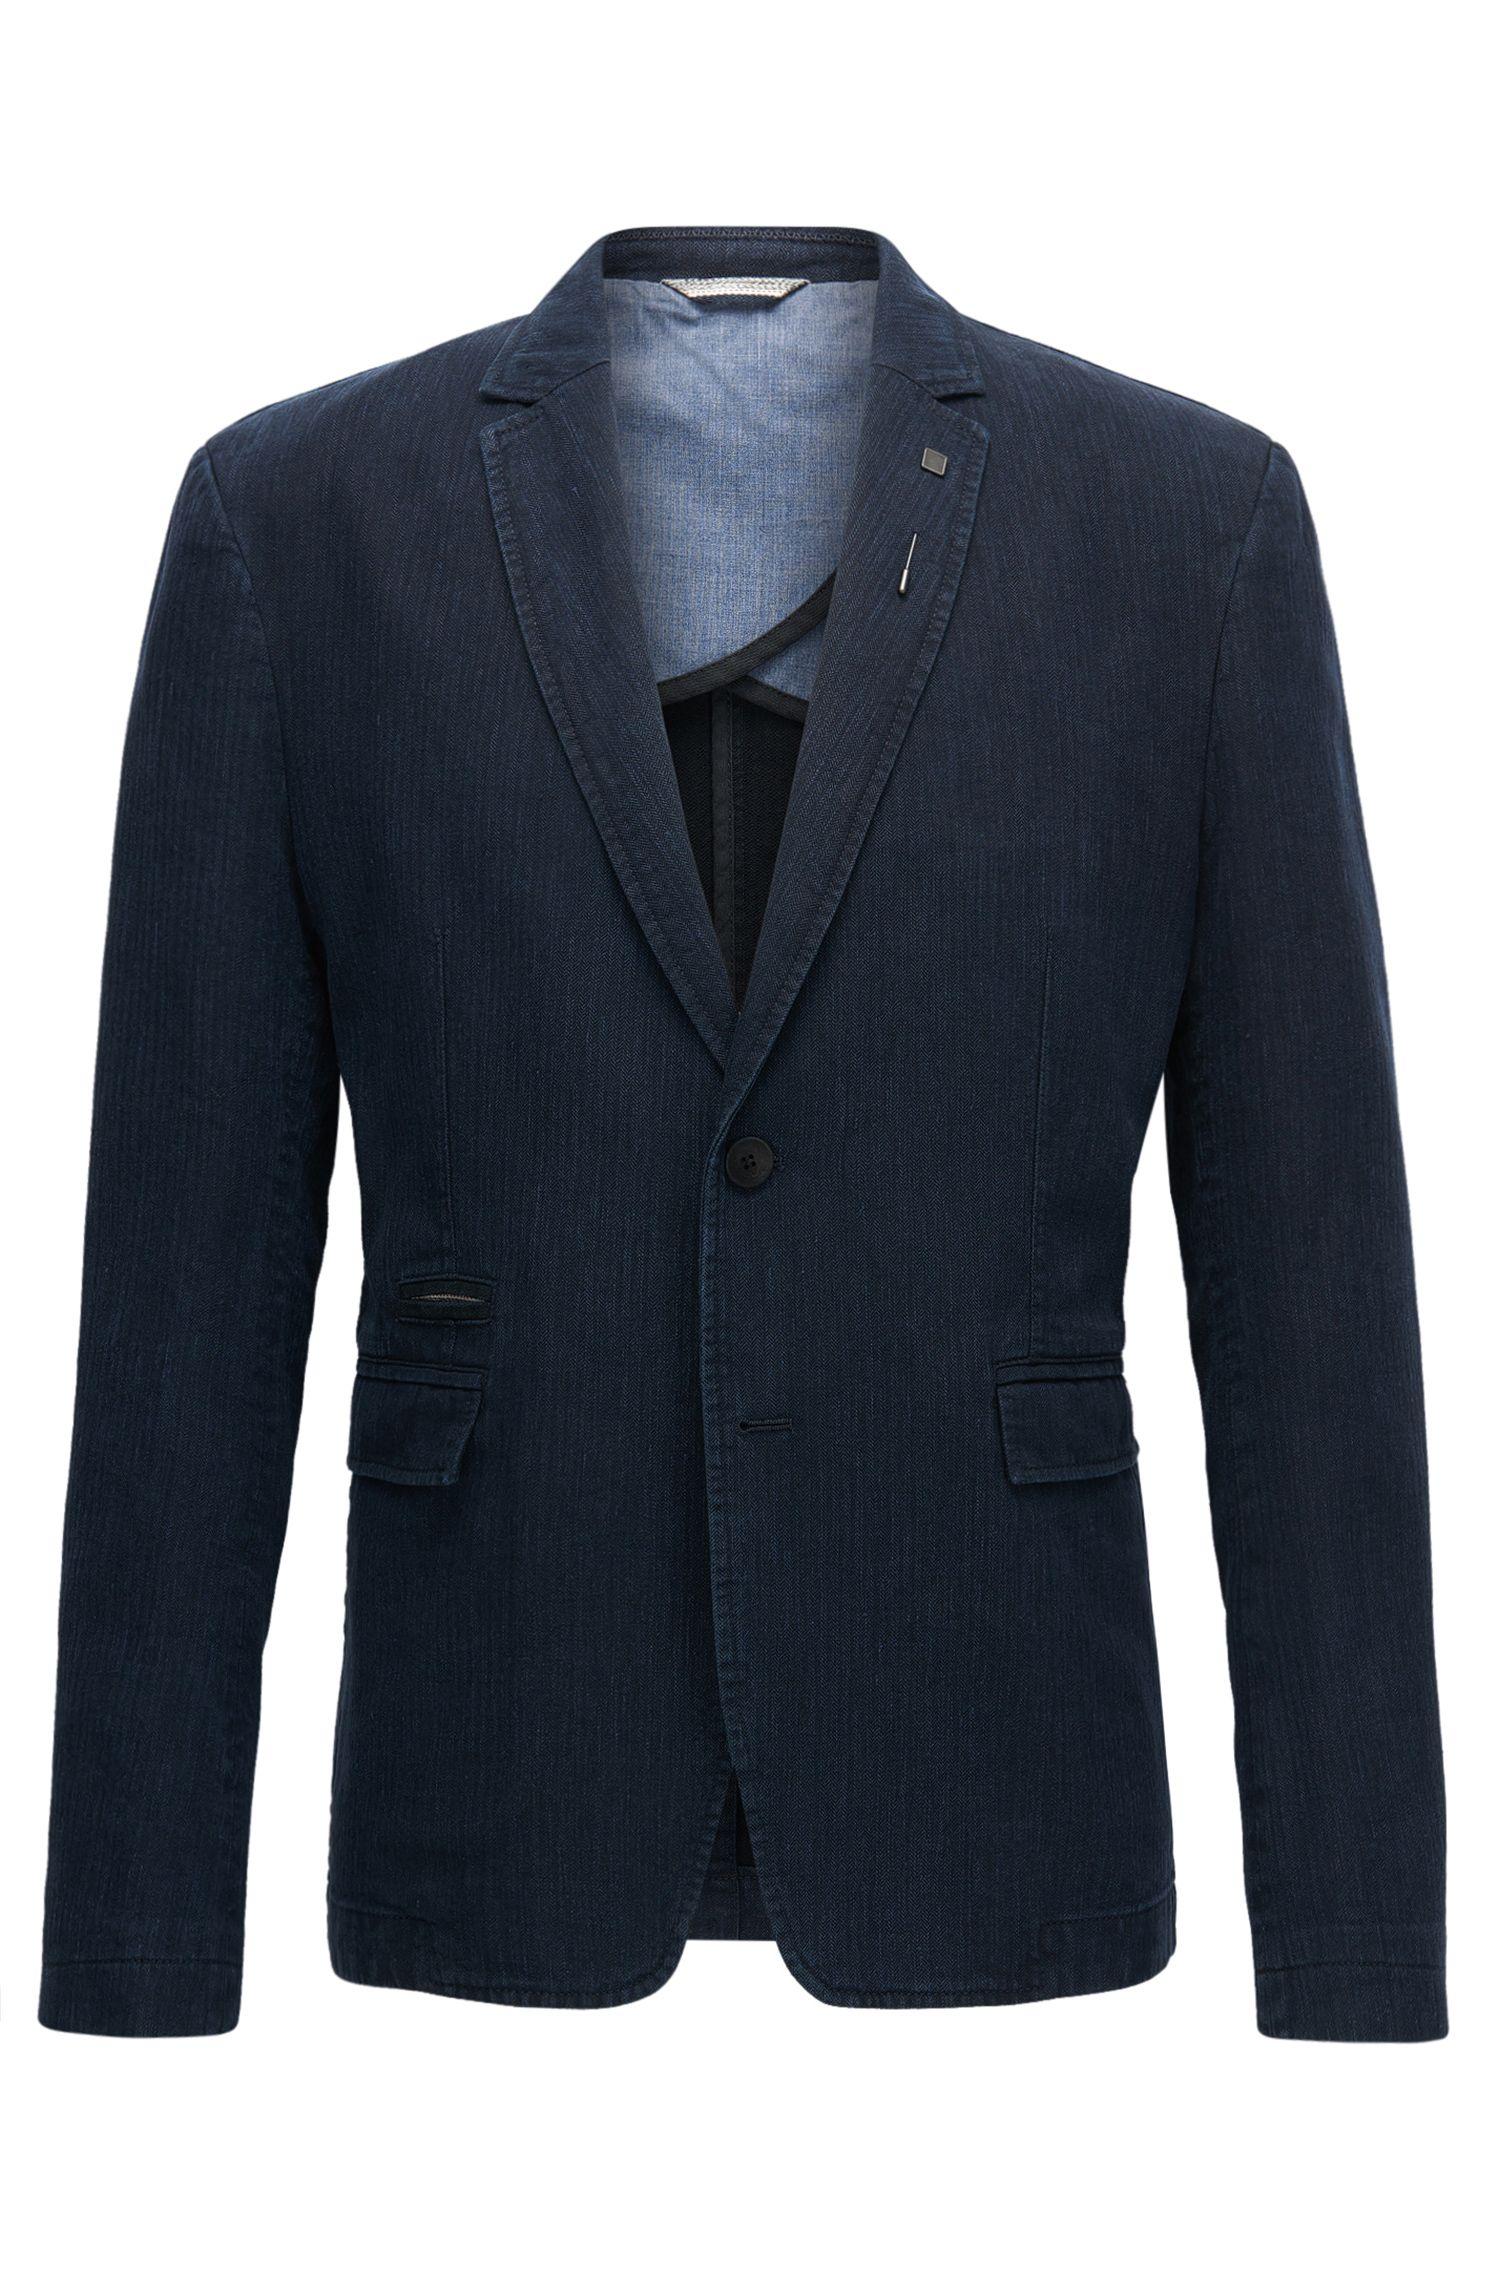 Herringbone Cotton Linen Sport Coat, Slim Fit | Baxed